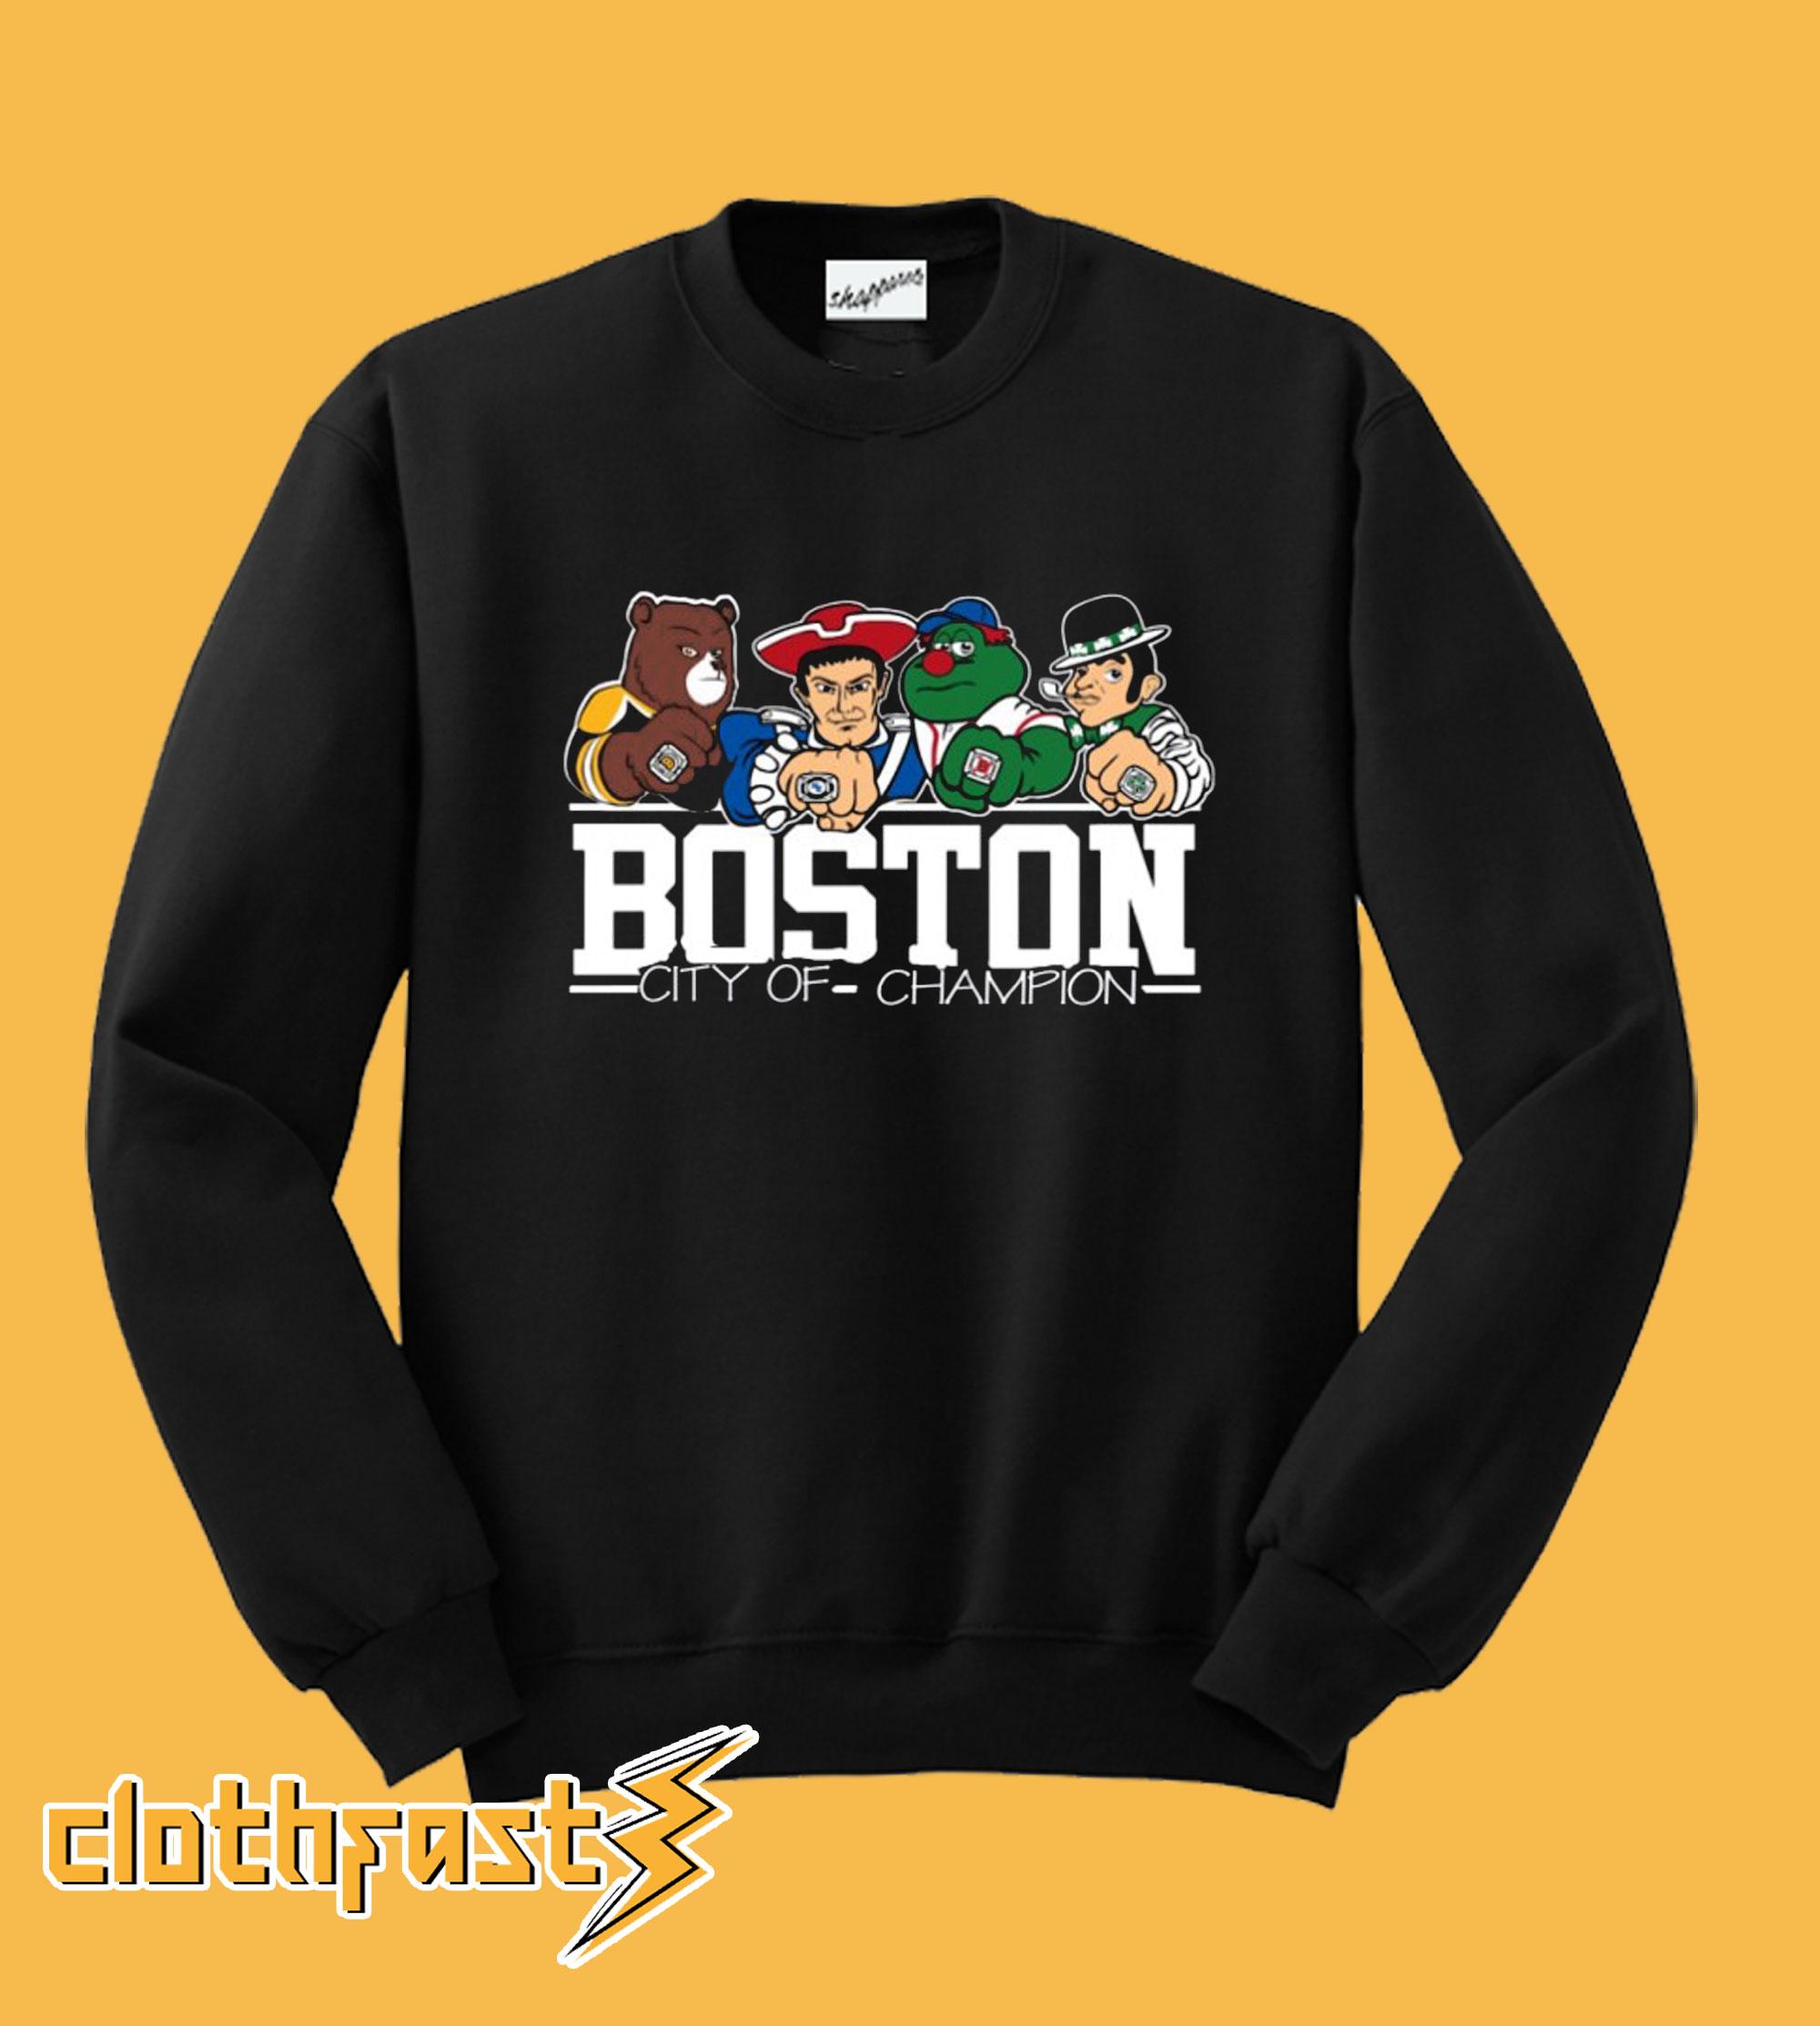 BOSTON City of Champion Sweatshirt